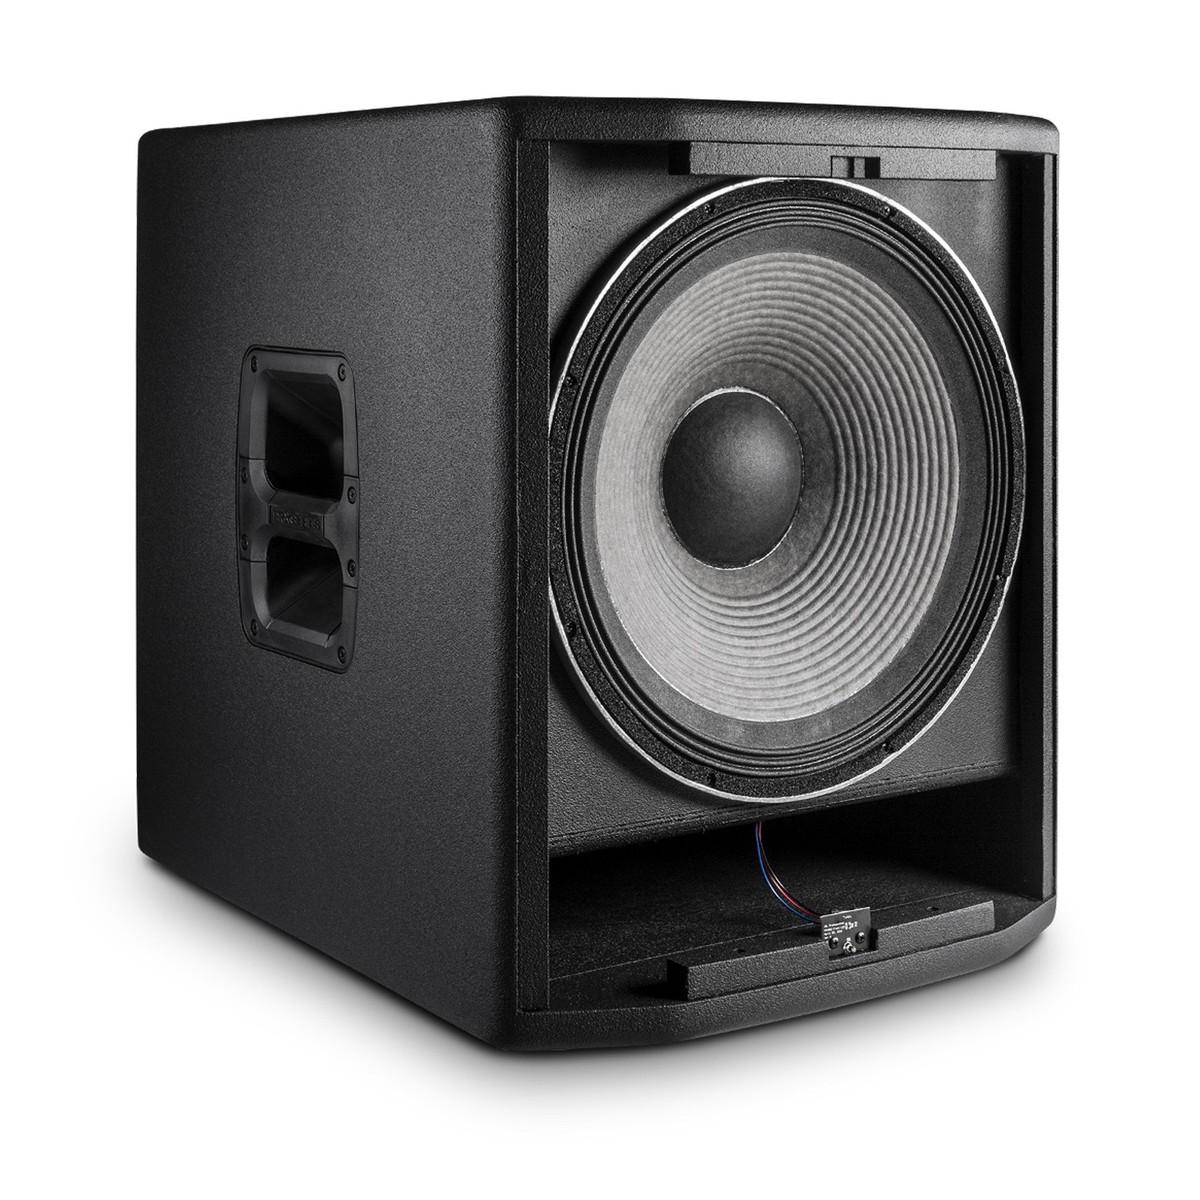 jbl prx815xlfw 15   active pa subwoofer at gear4music com Subwoofer Speaker Biggest Subwoofer in the World